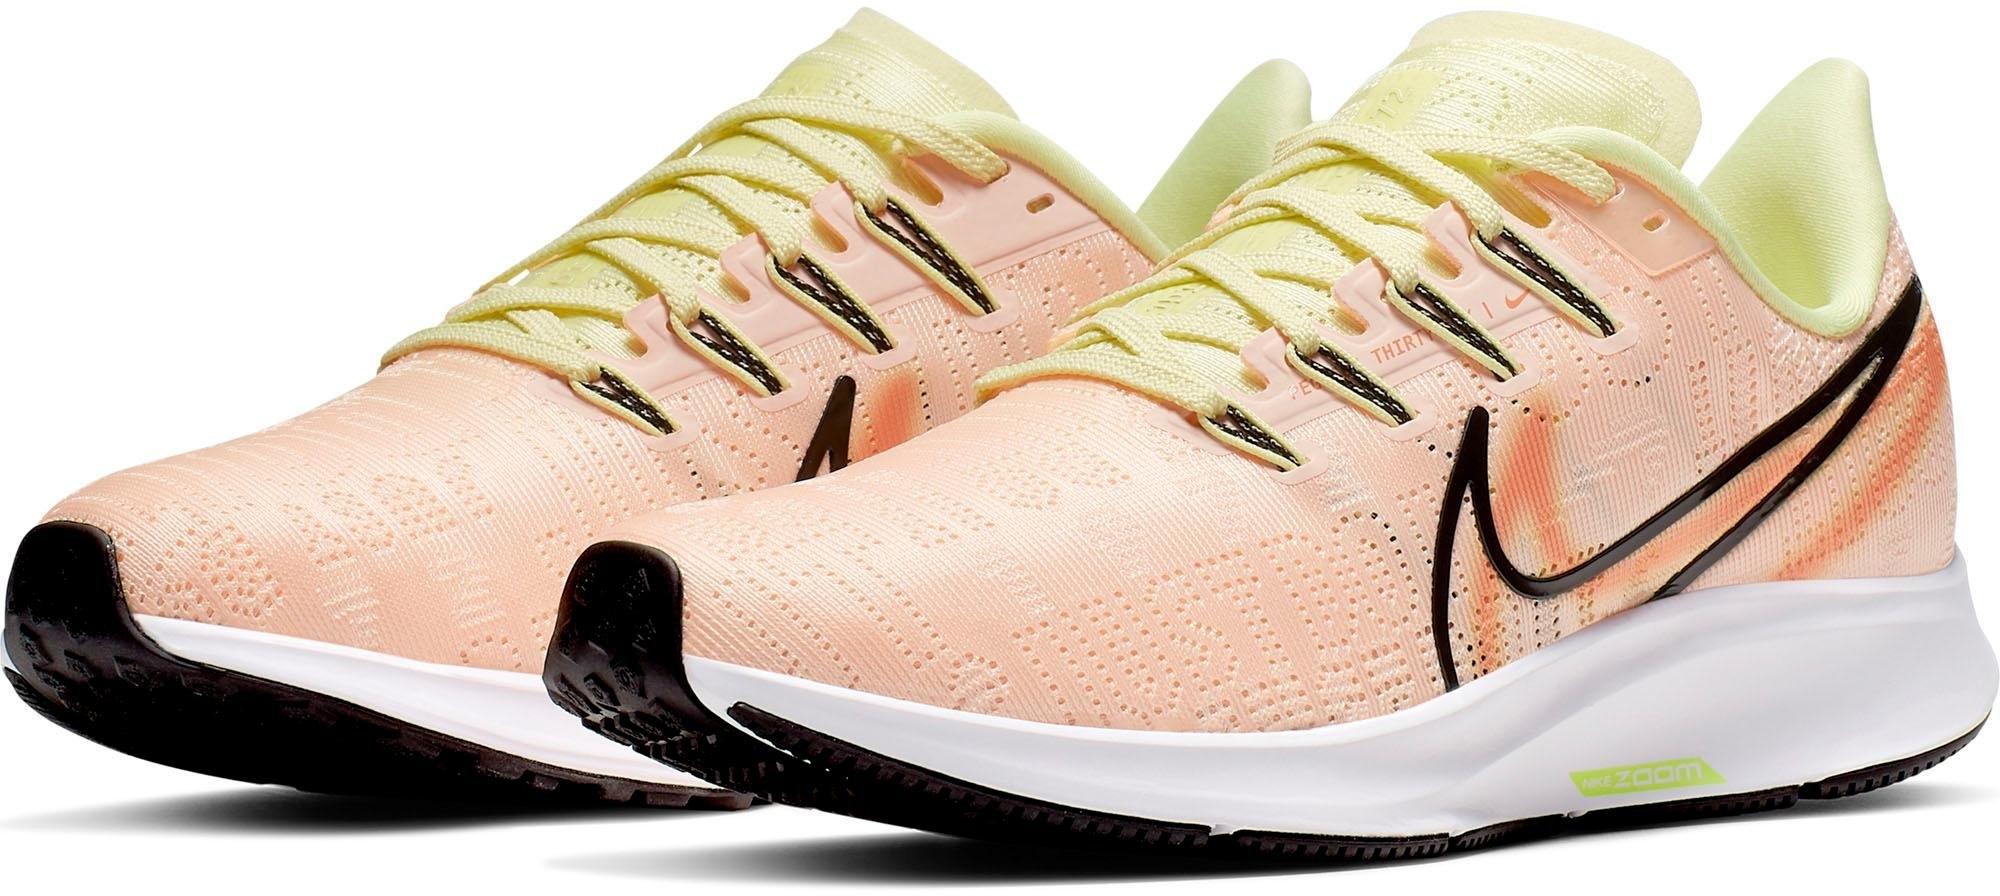 Nike runningschoenen »Wmns Pegasus 36 Premium Rise« bij OTTO online kopen